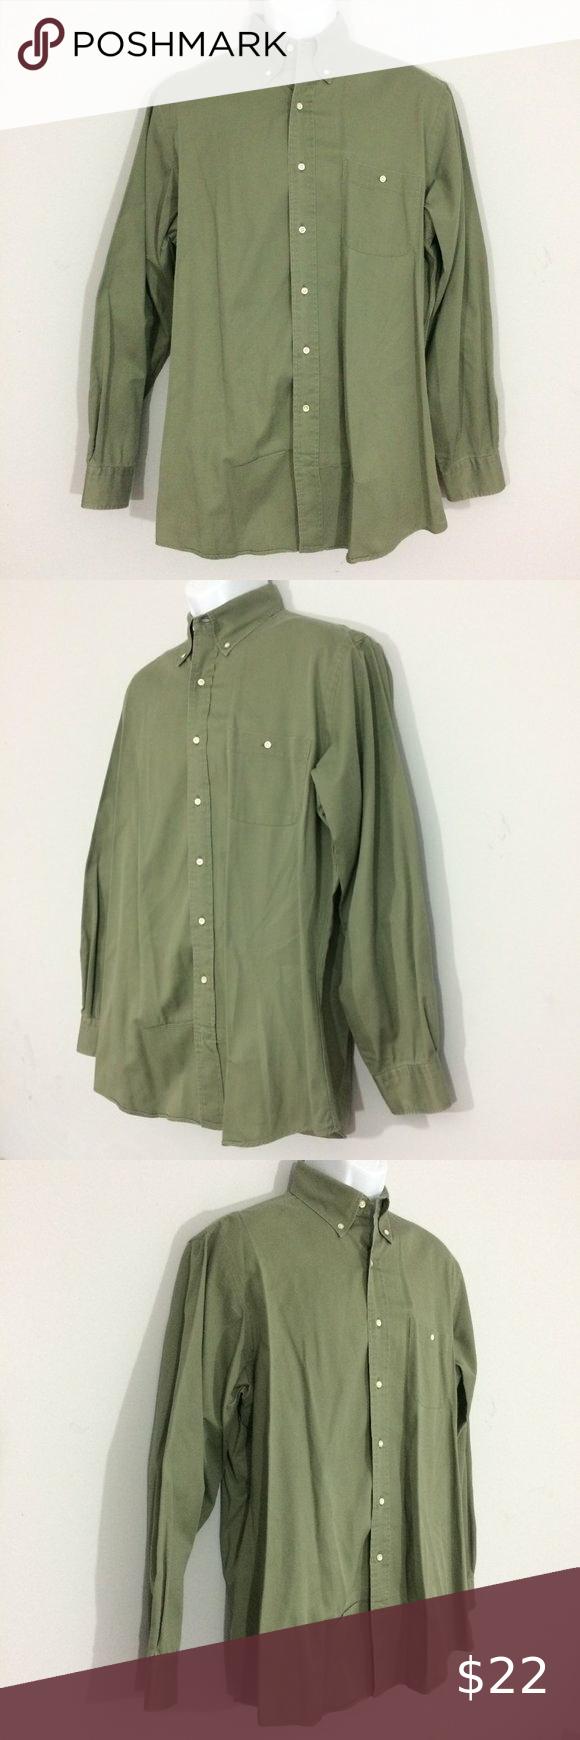 Jos A Bank Mens 16.5 3536 Green Button Up Shirt Jos A